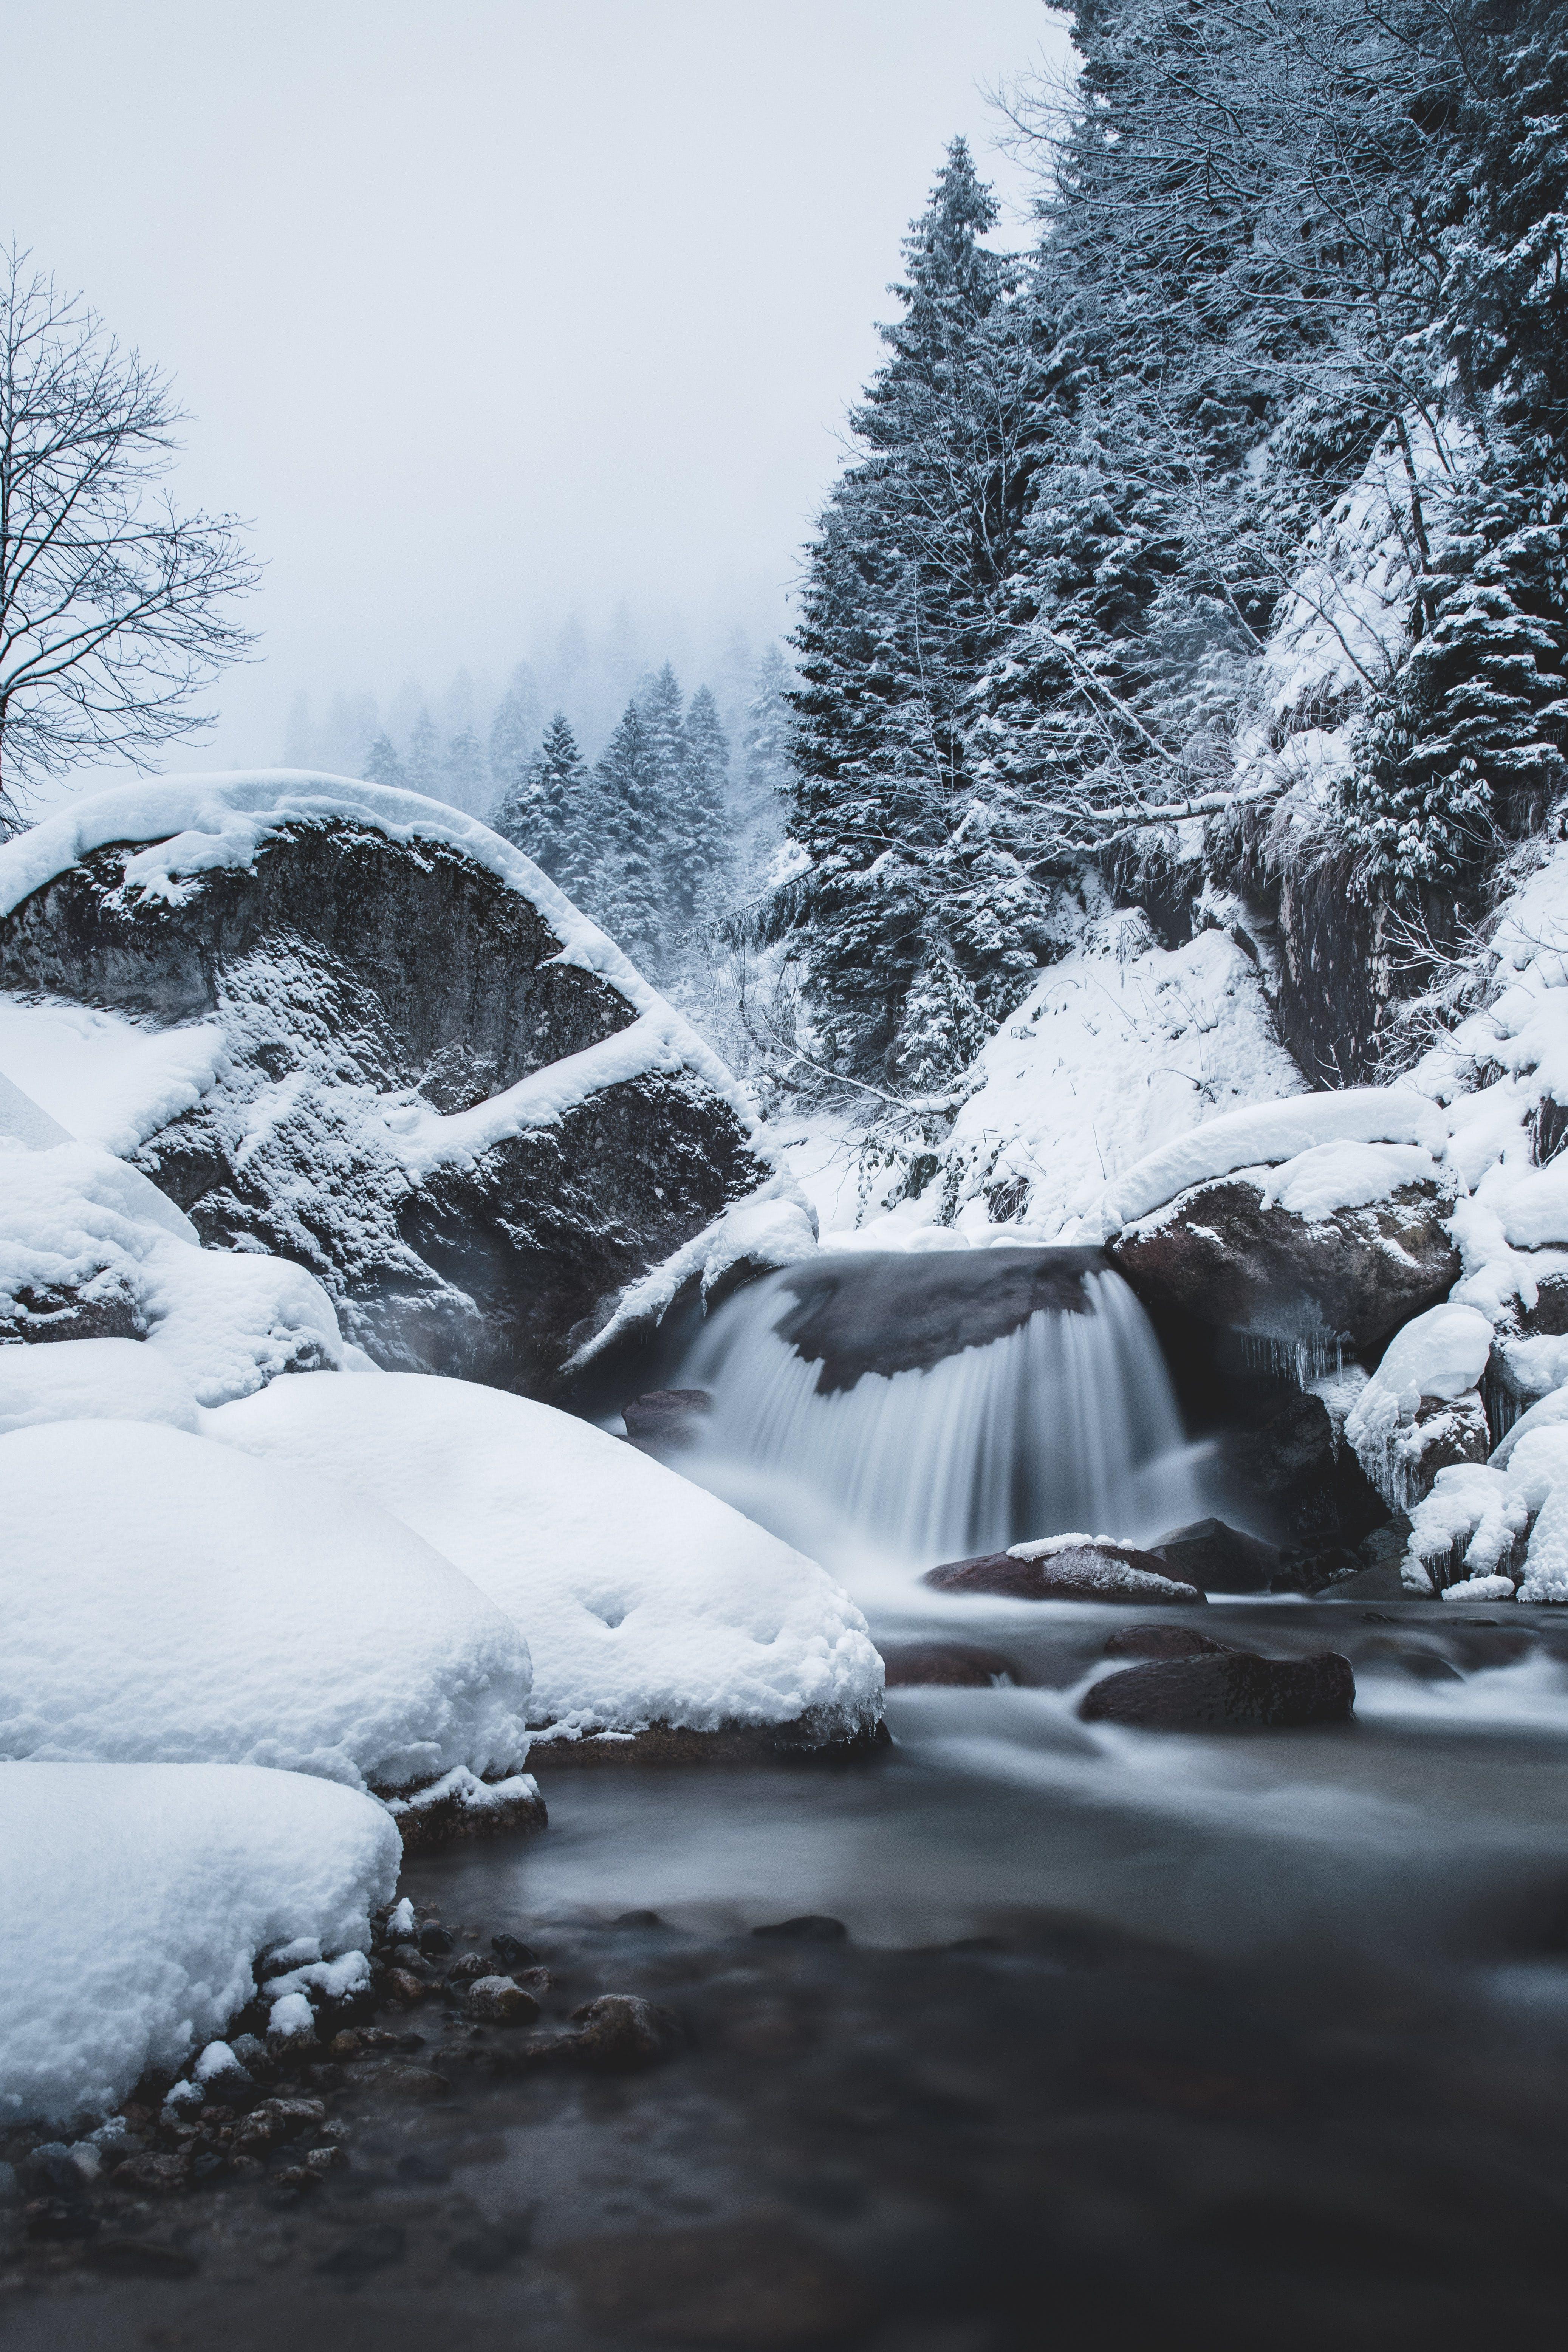 ICEE, 下雪的, 下雪的天氣, 冬季 的 免费素材照片